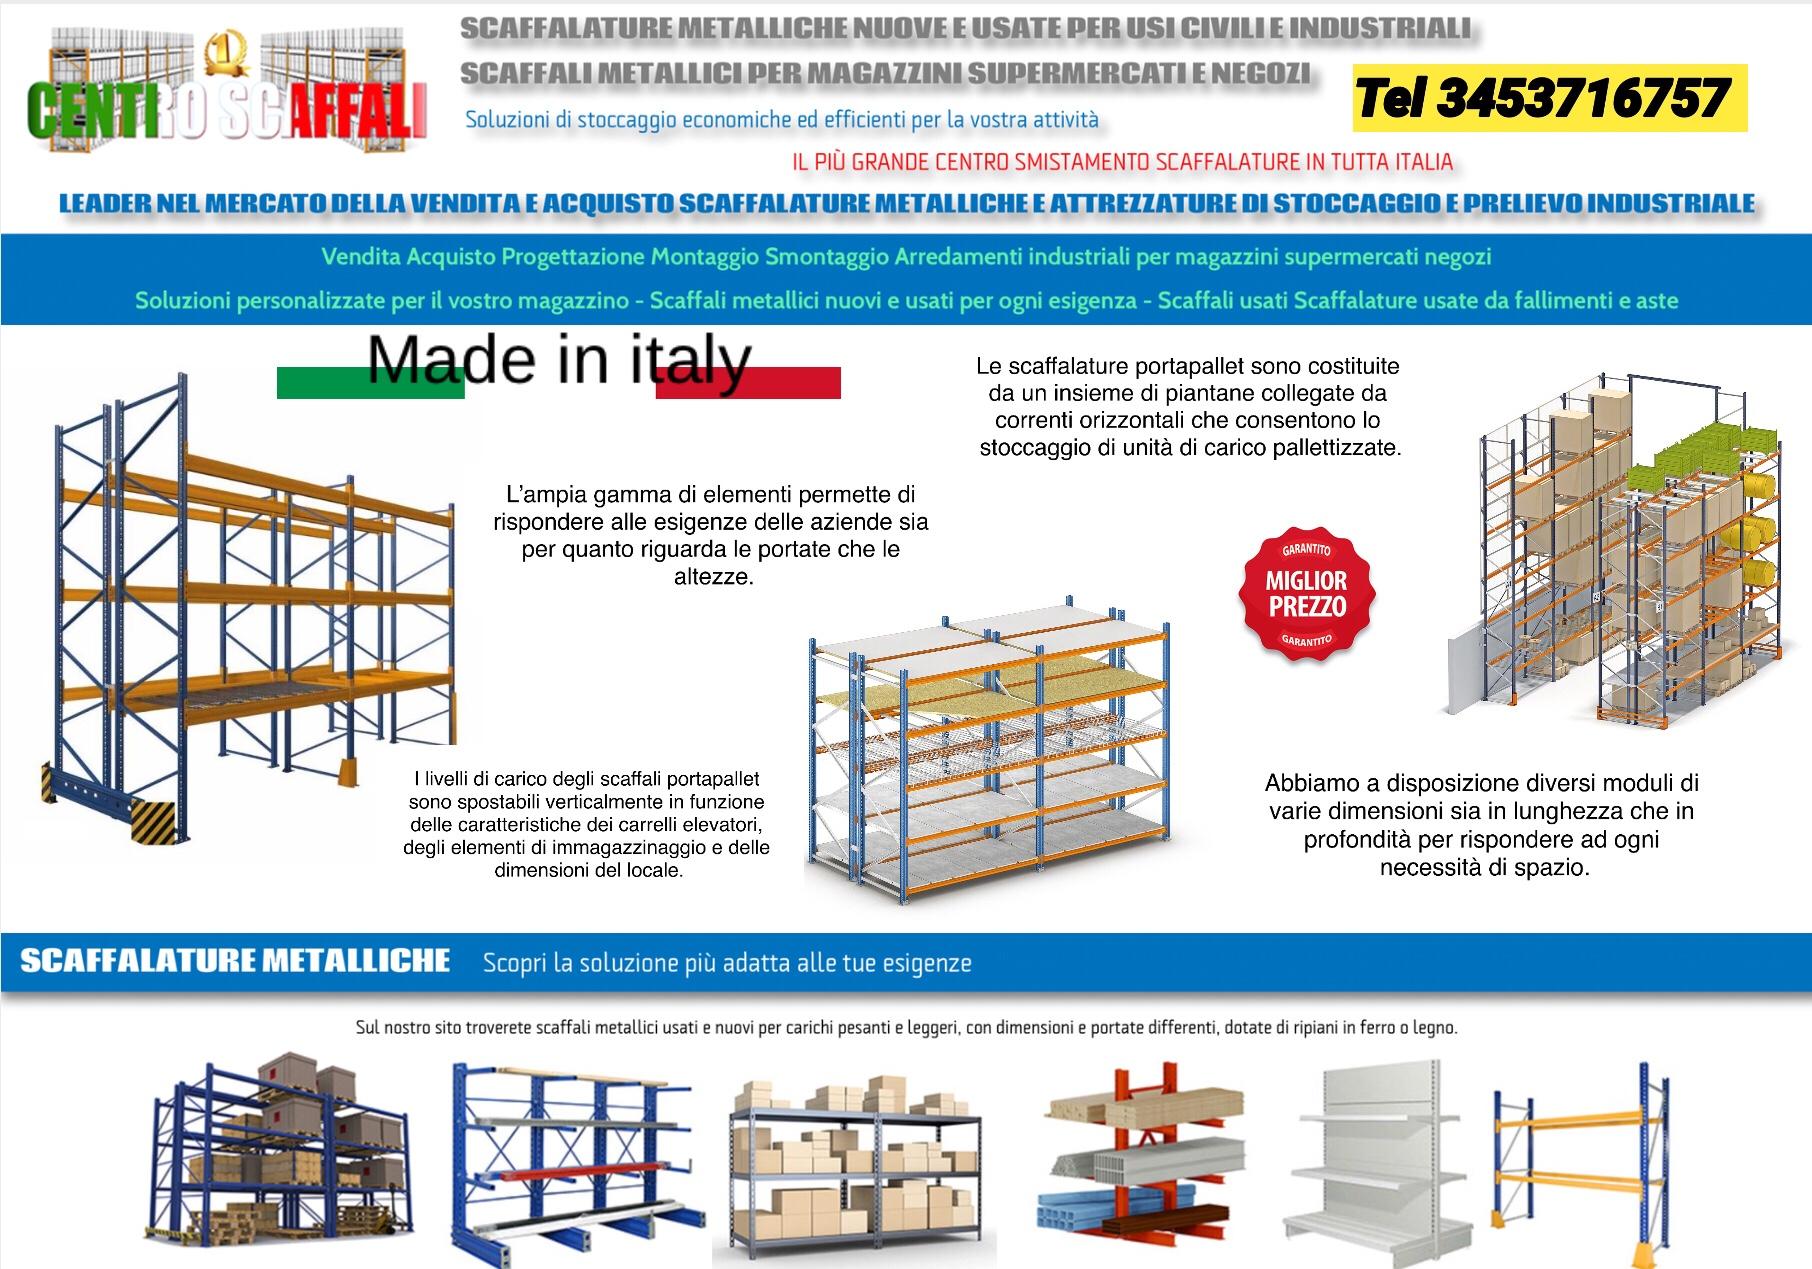 Scaffali Metallici A Torino.Scaffalature Metalliche Industriali Nuove E Usate Vendita